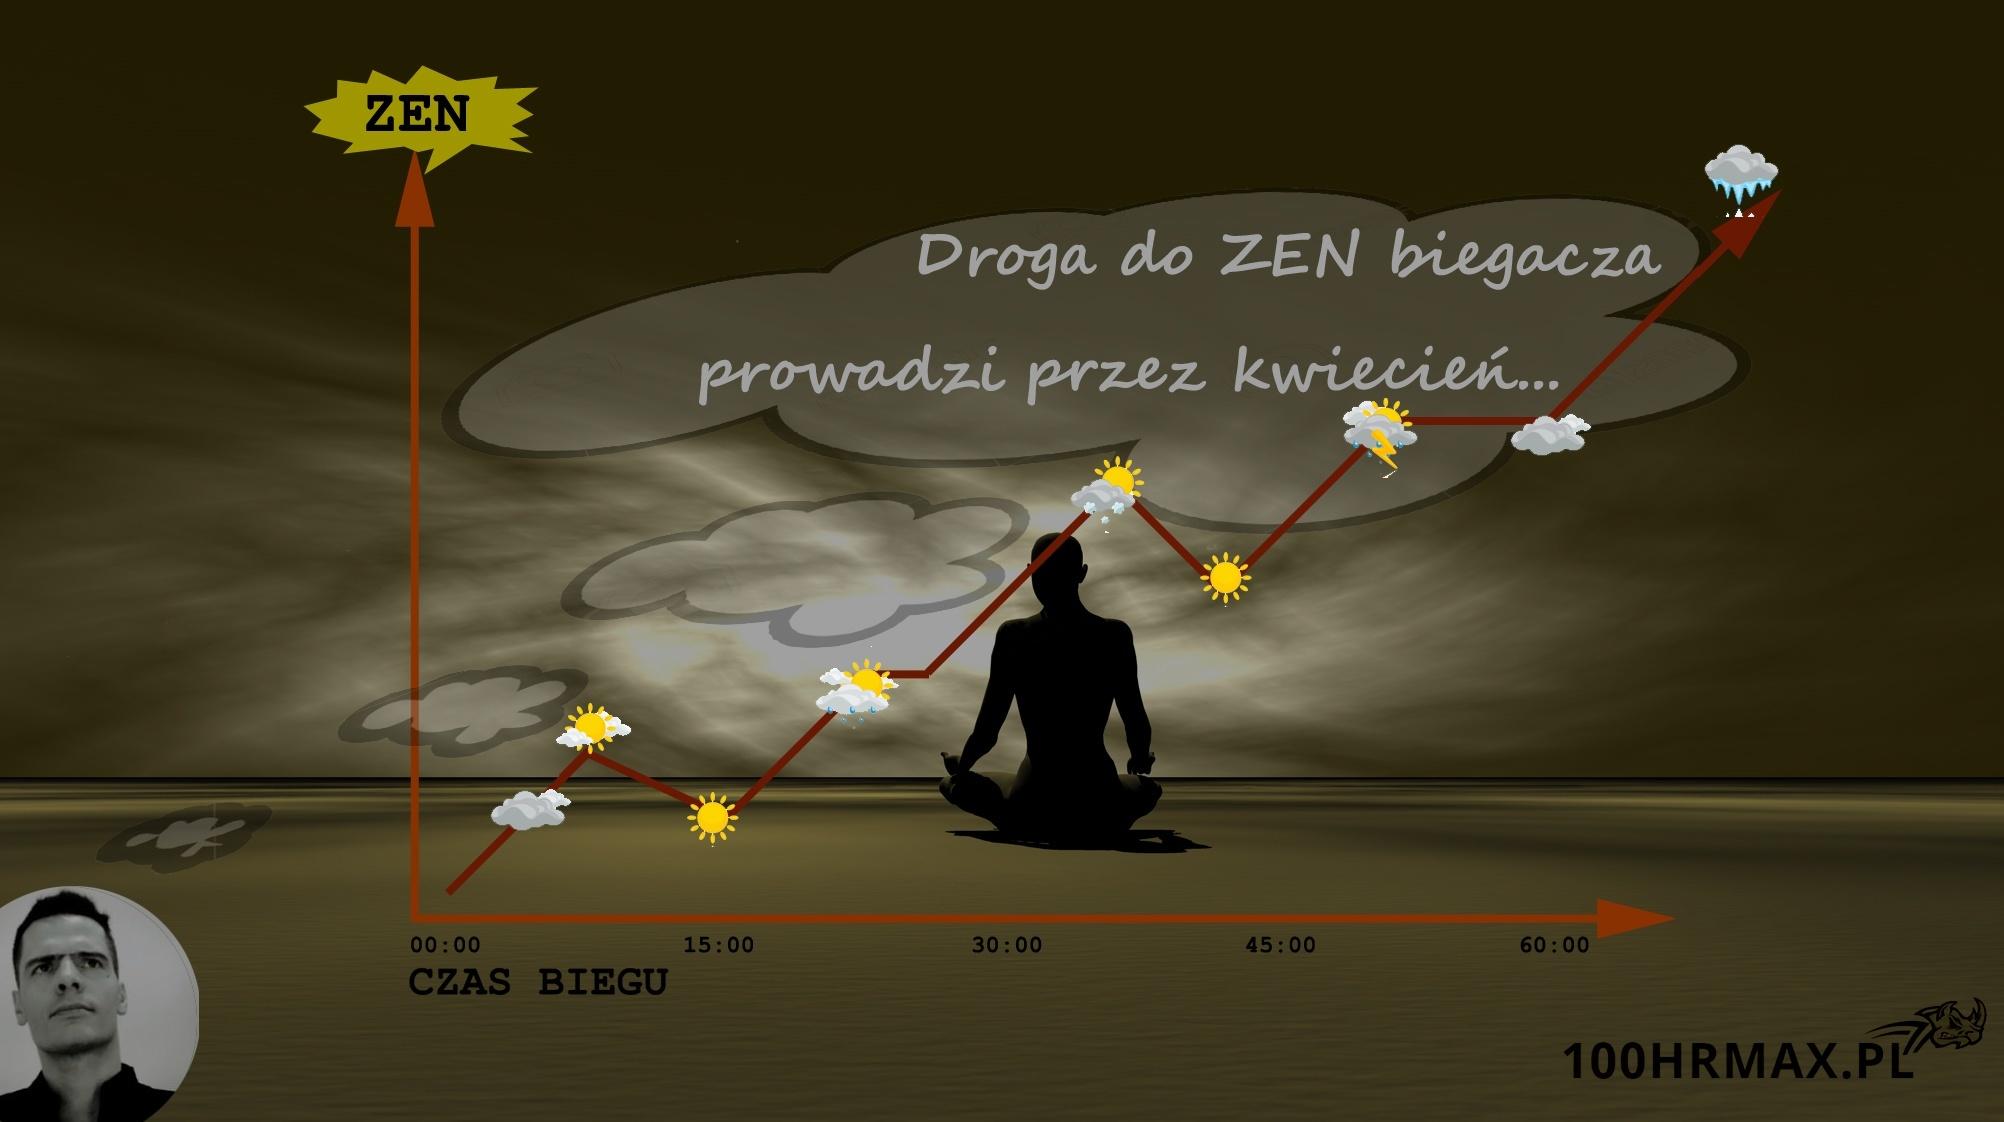 Zen biegacza